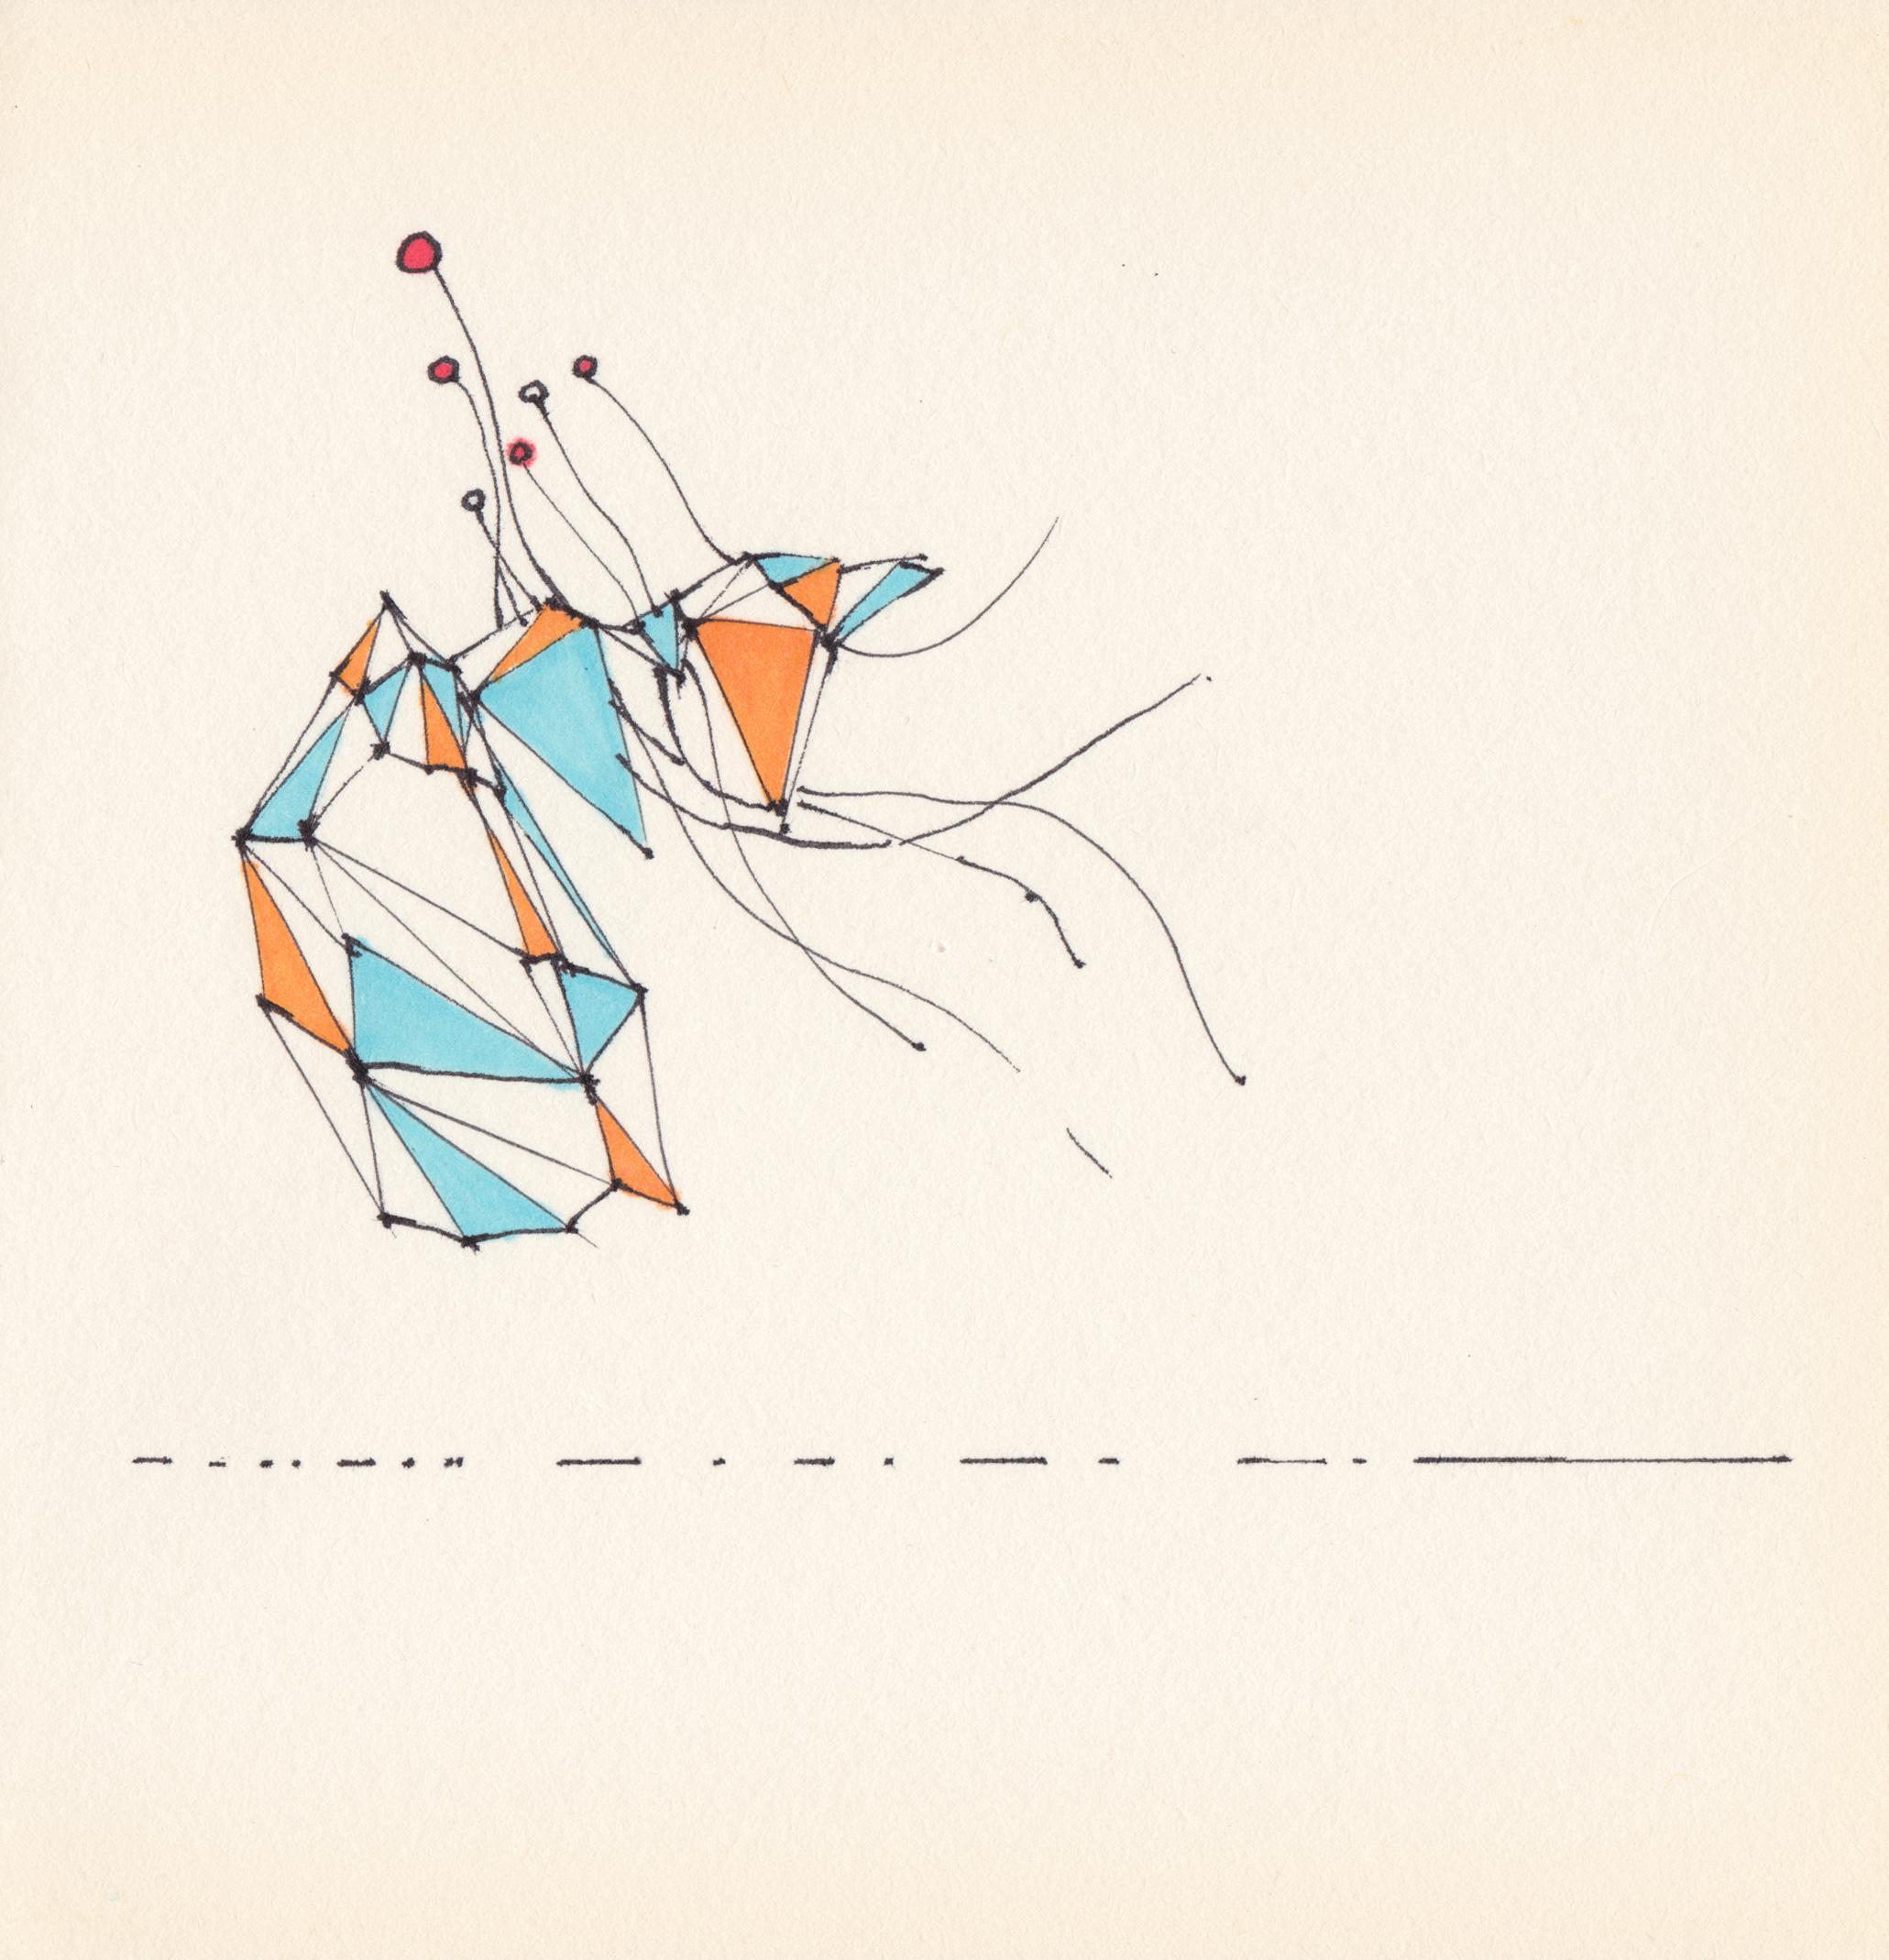 JEREMY RUMAS ART + PEN and MARKER SKETCHES 02 + abstract futurism + modern art +www.jeremyrumas.com.jpeg